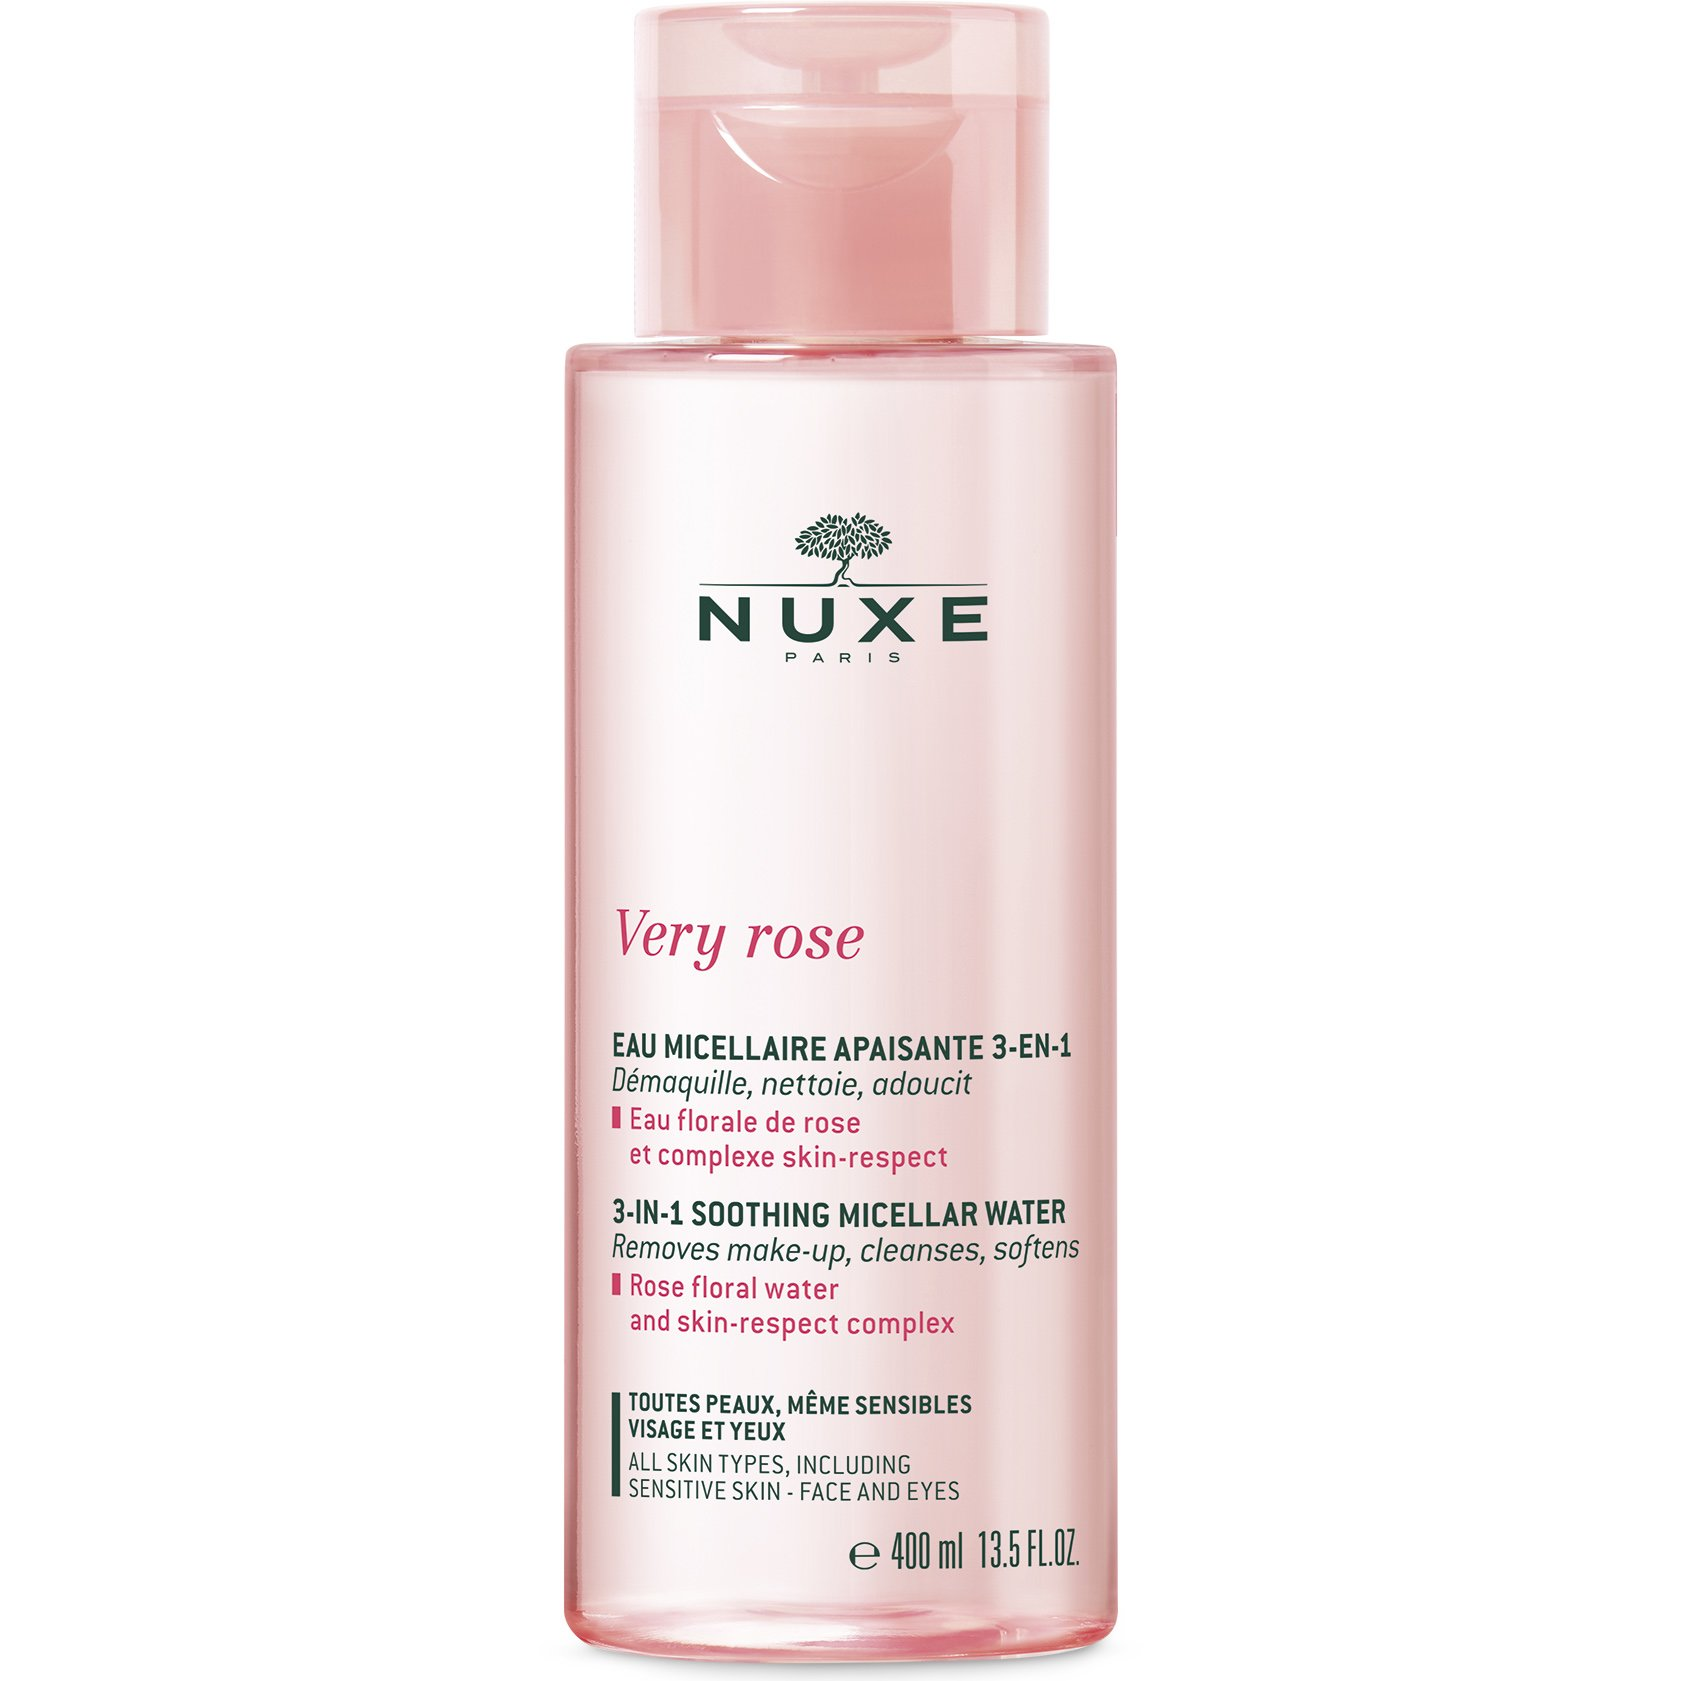 Nuxe Very Rose Soothing Micellar Water 3 in 1 Απαλό Μικυλλιακό Νερό Καθαρισμού & Ντεμακιγιάζ με Ροδόνερο 400ml